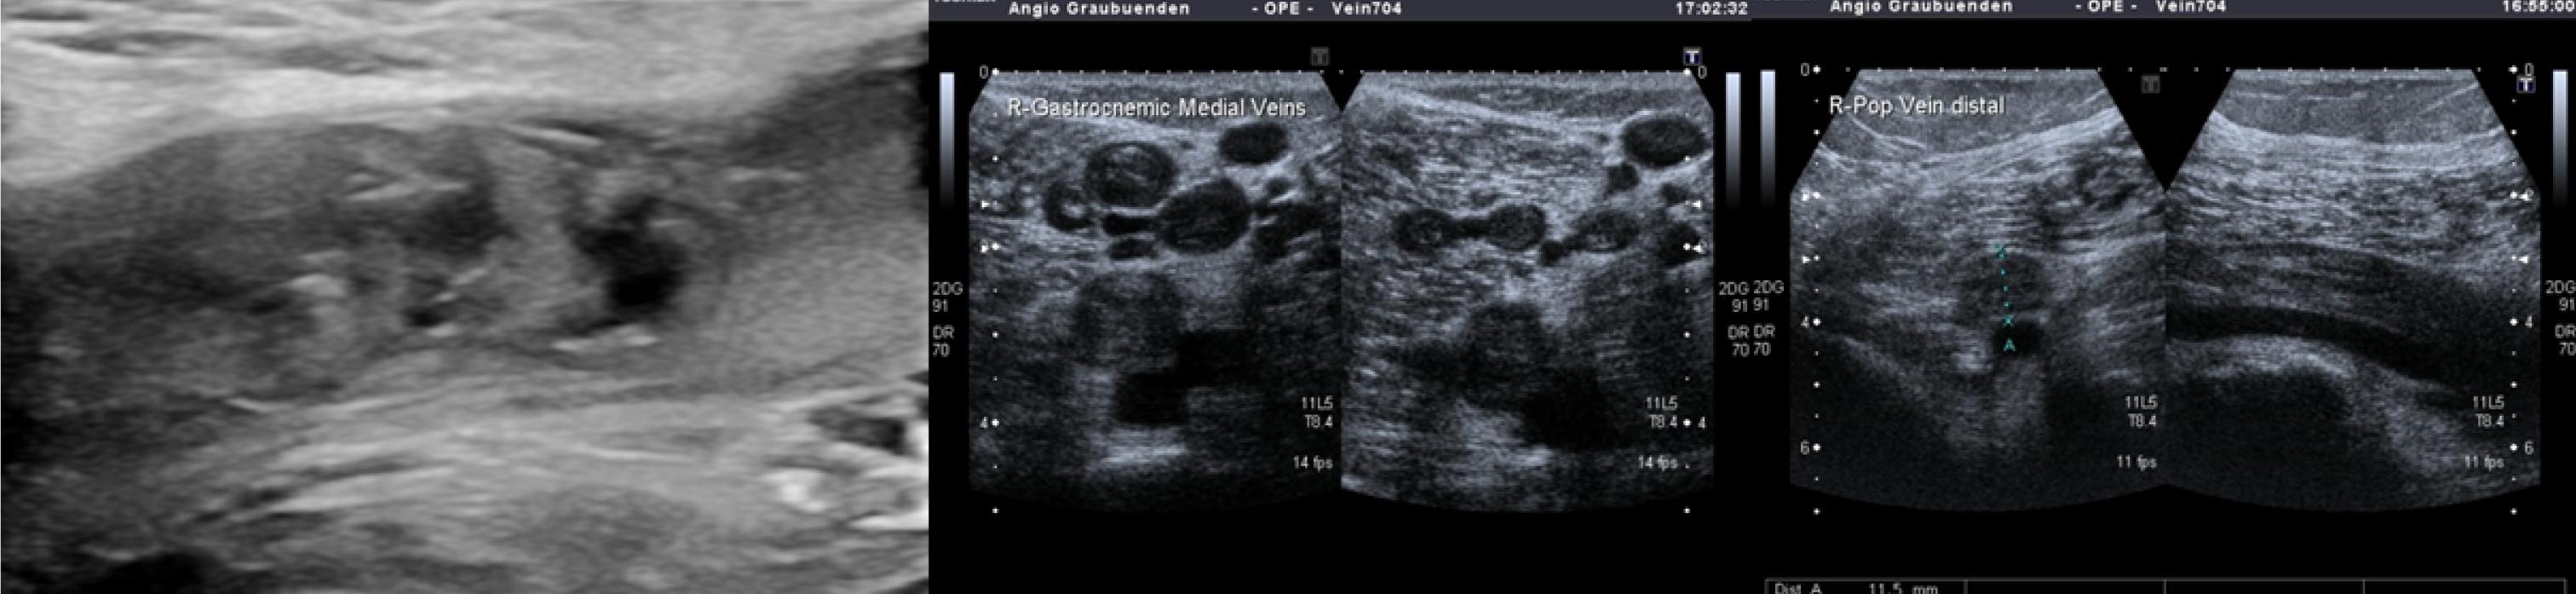 Duplexsonographie Thrombose